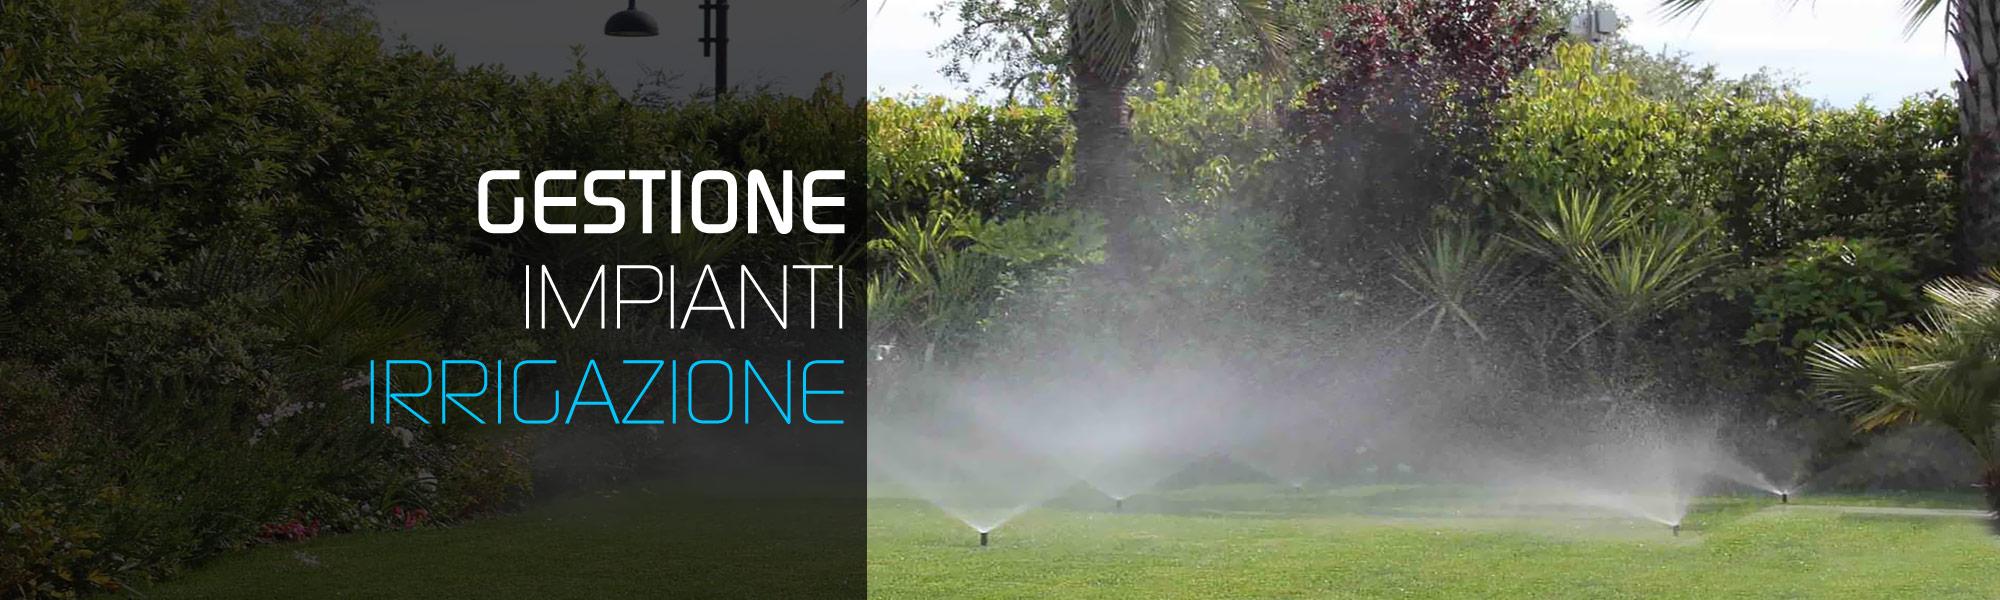 home5-impianti-irrigazione